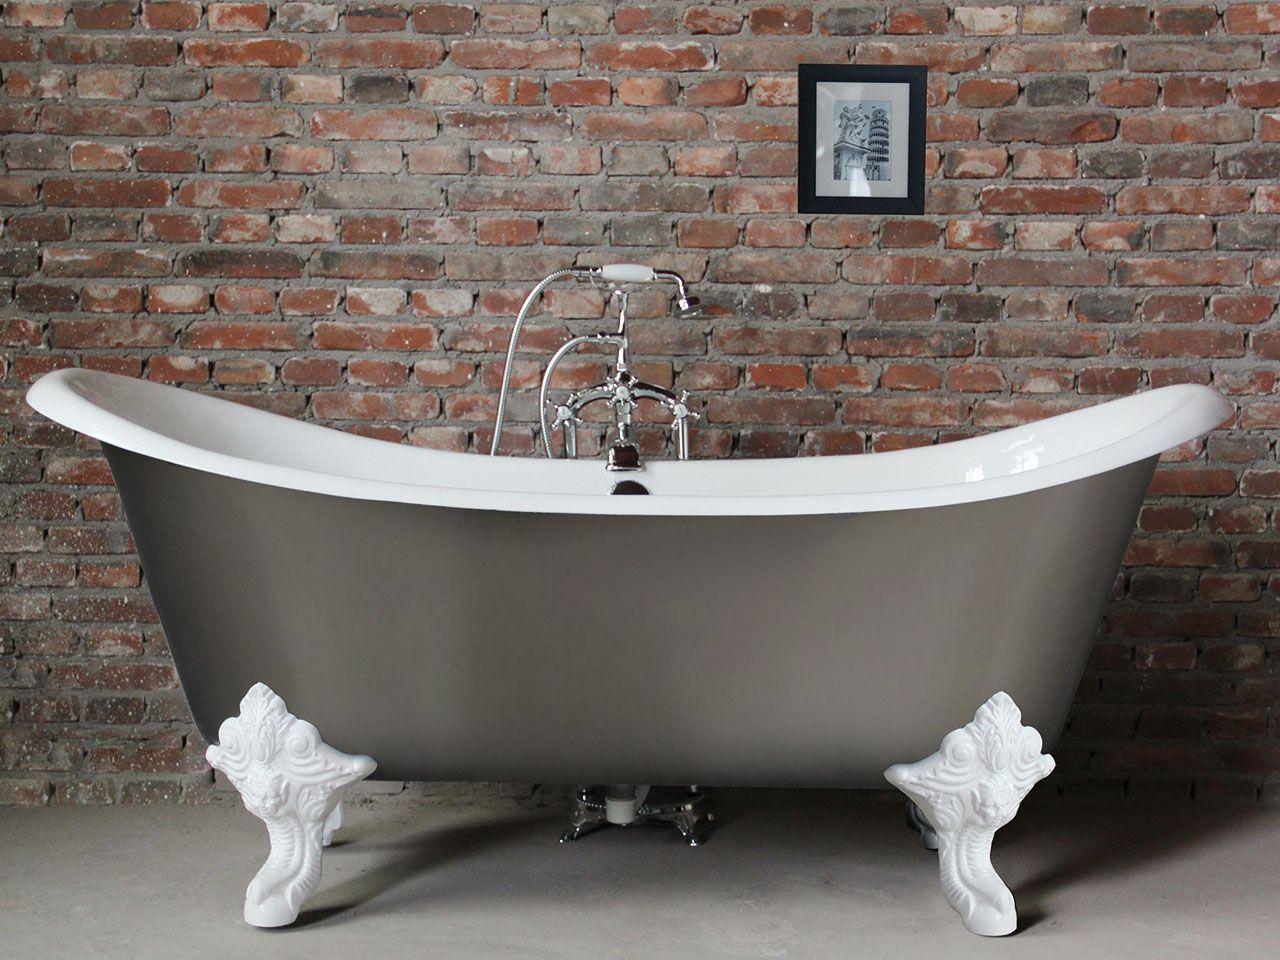 Vasca lucrezia 186x77 bianco grigio iperceramica vasche da bagno pinterest - Vasca da bagno grigia ...